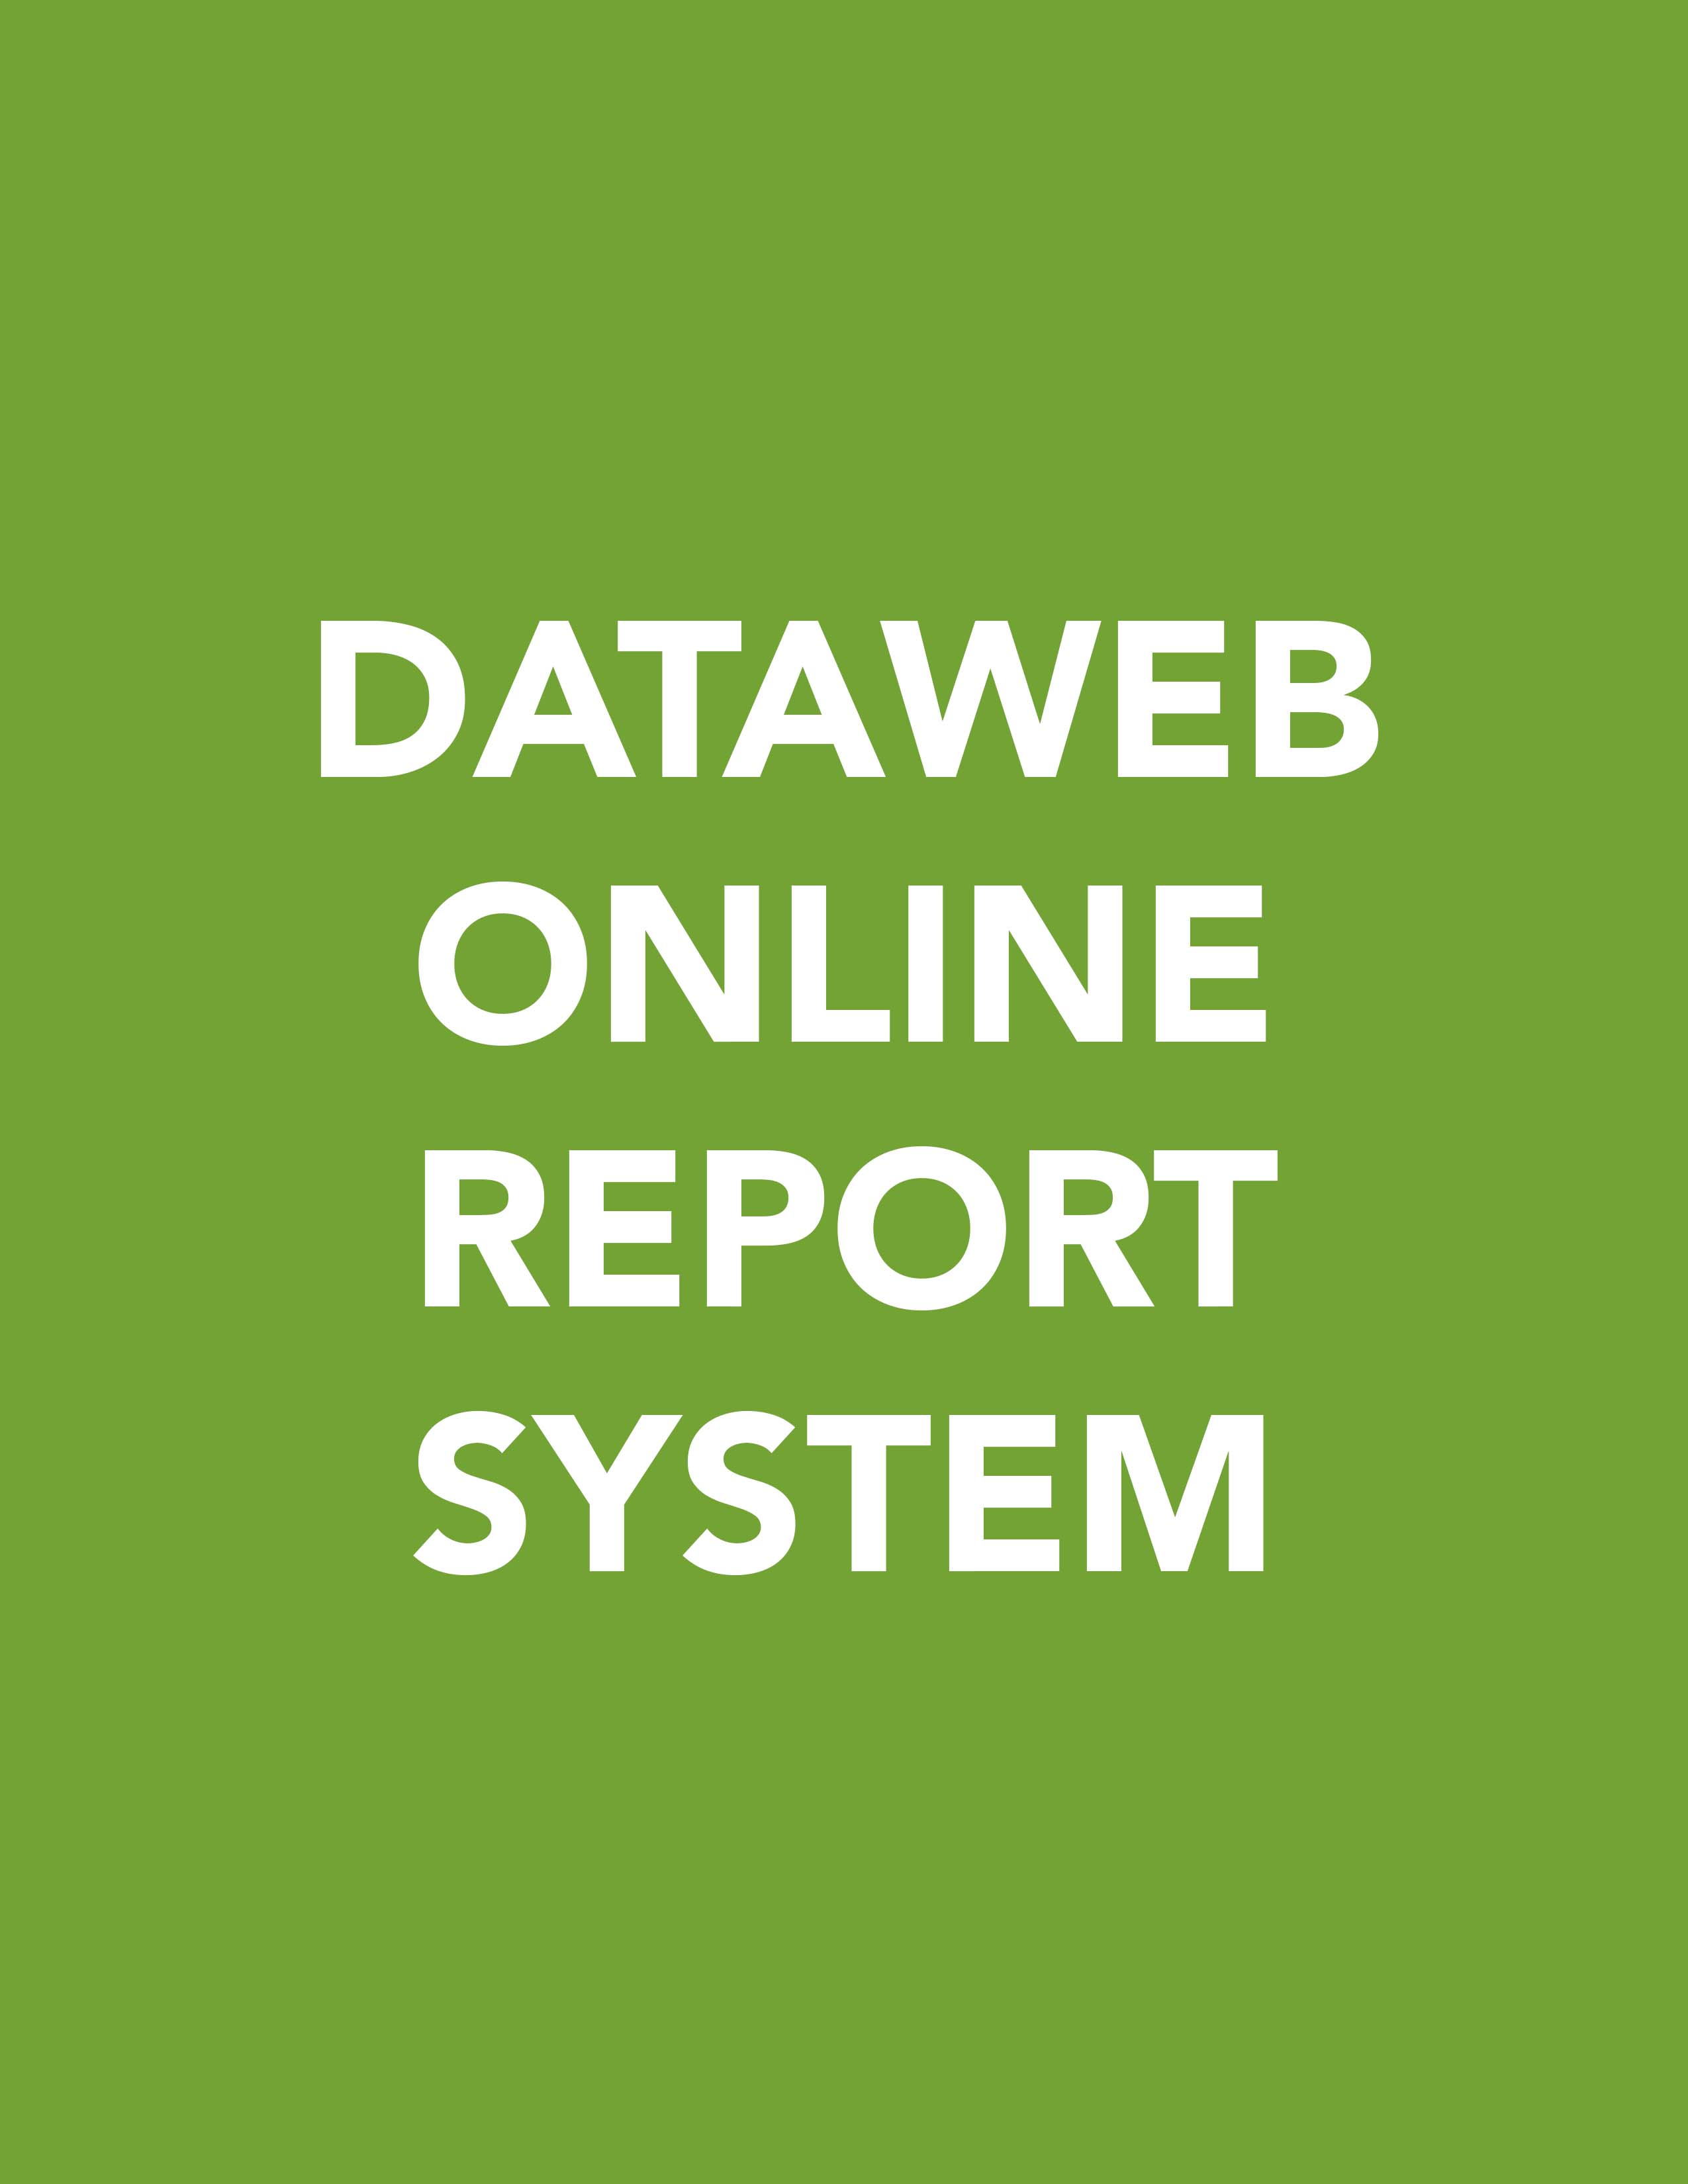 Dataweb Online Report System